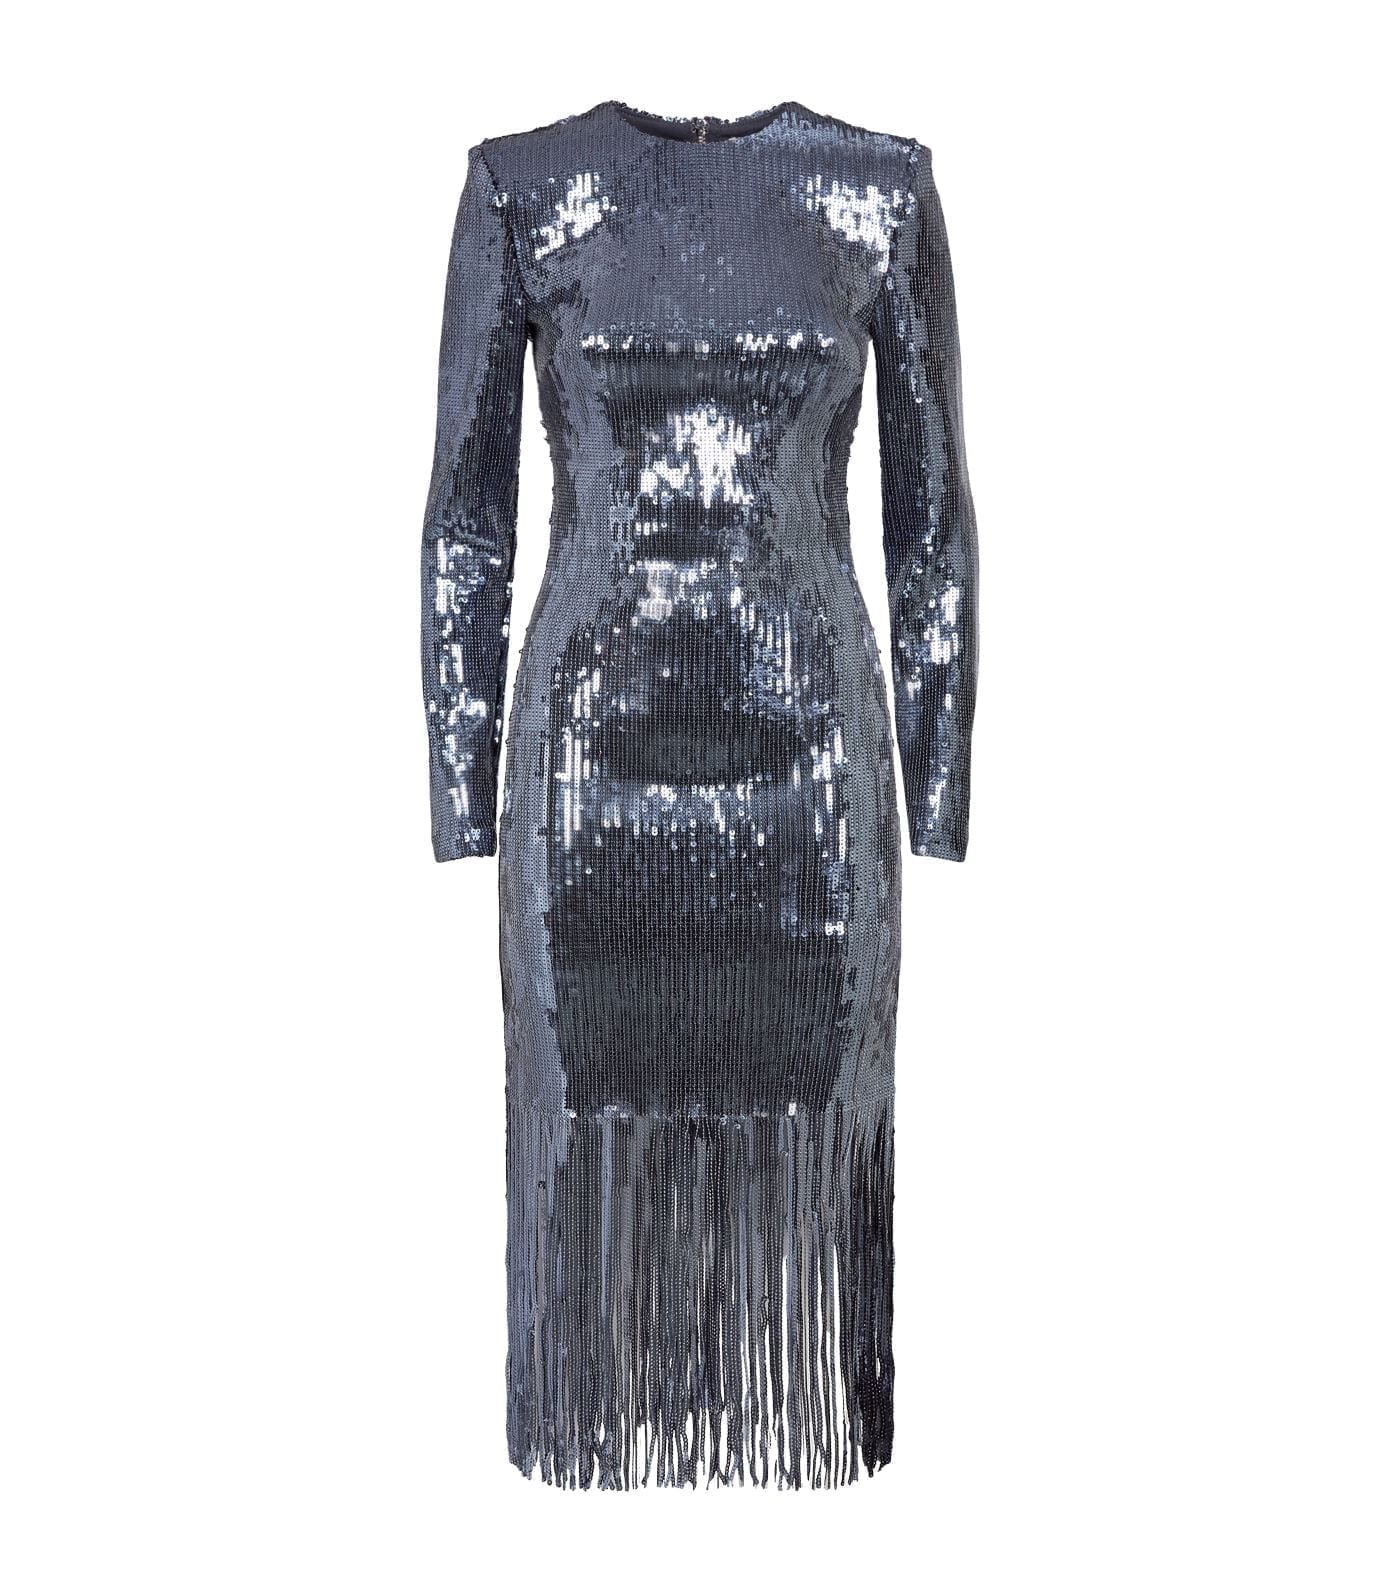 REBECCA VALLANCE Matisse Sequin Dress